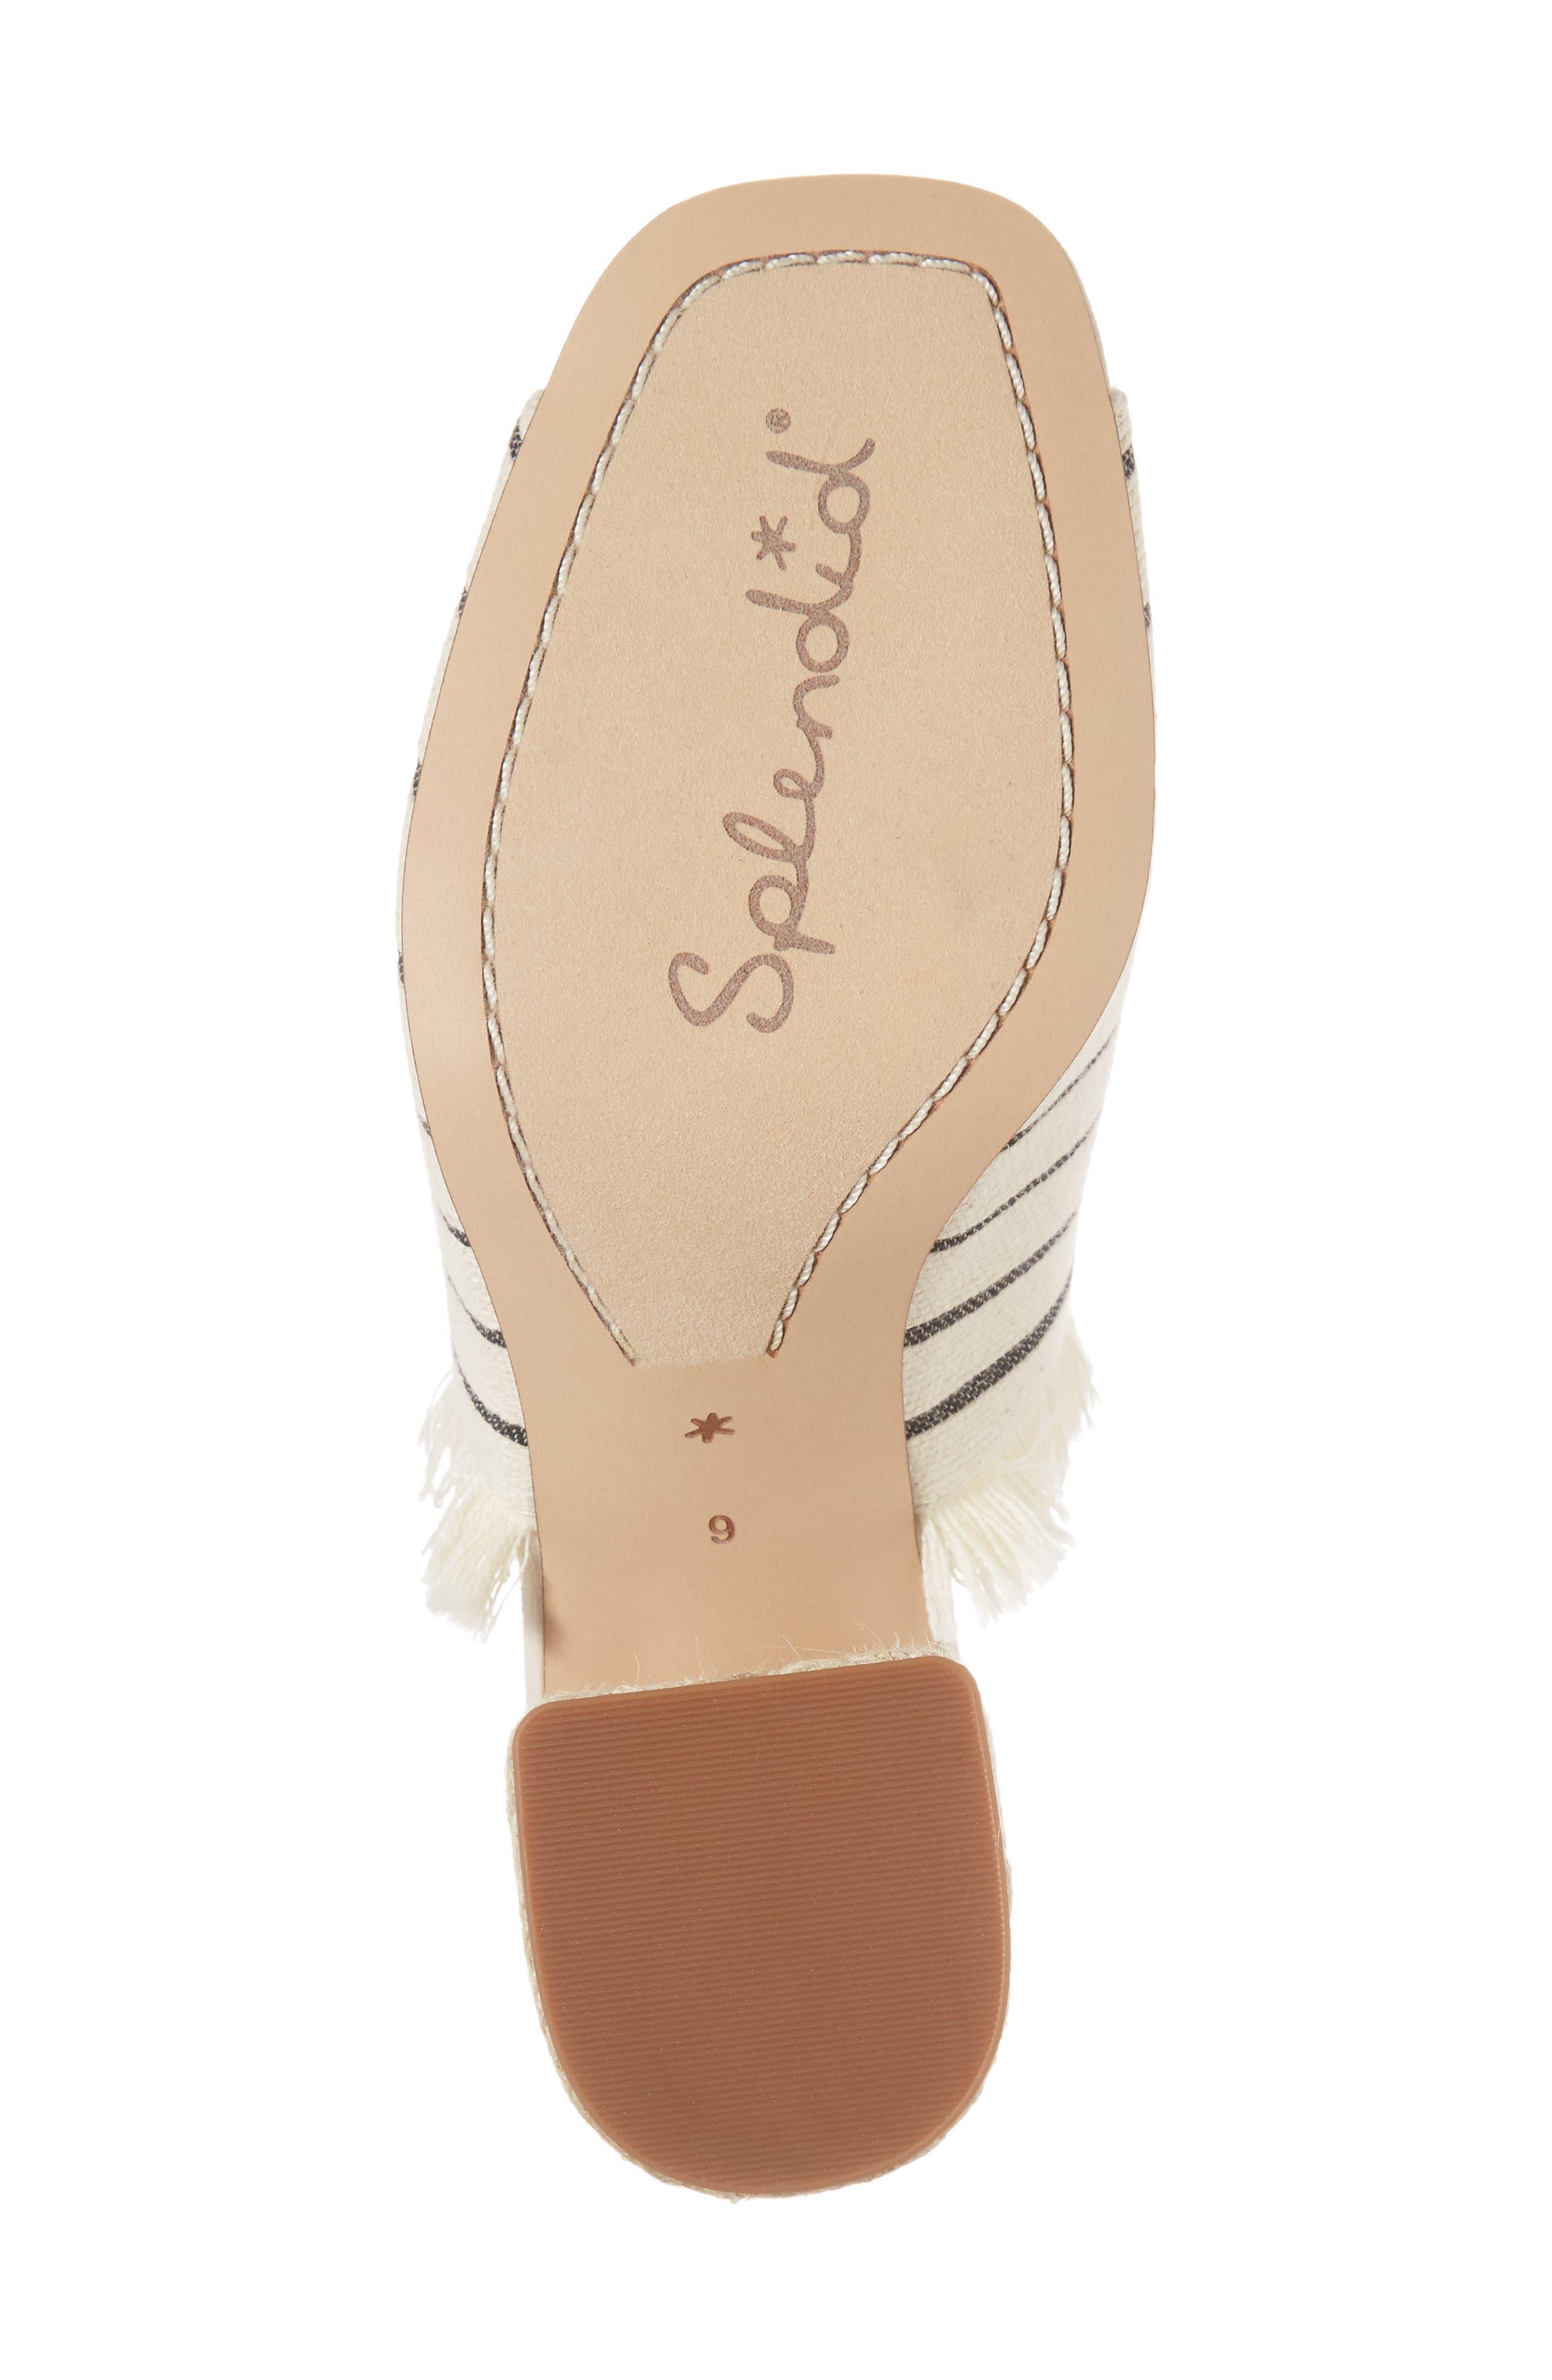 Baron Fringed Block Heel Slide,                             Alternate thumbnail 6, color,                             Cream Leather